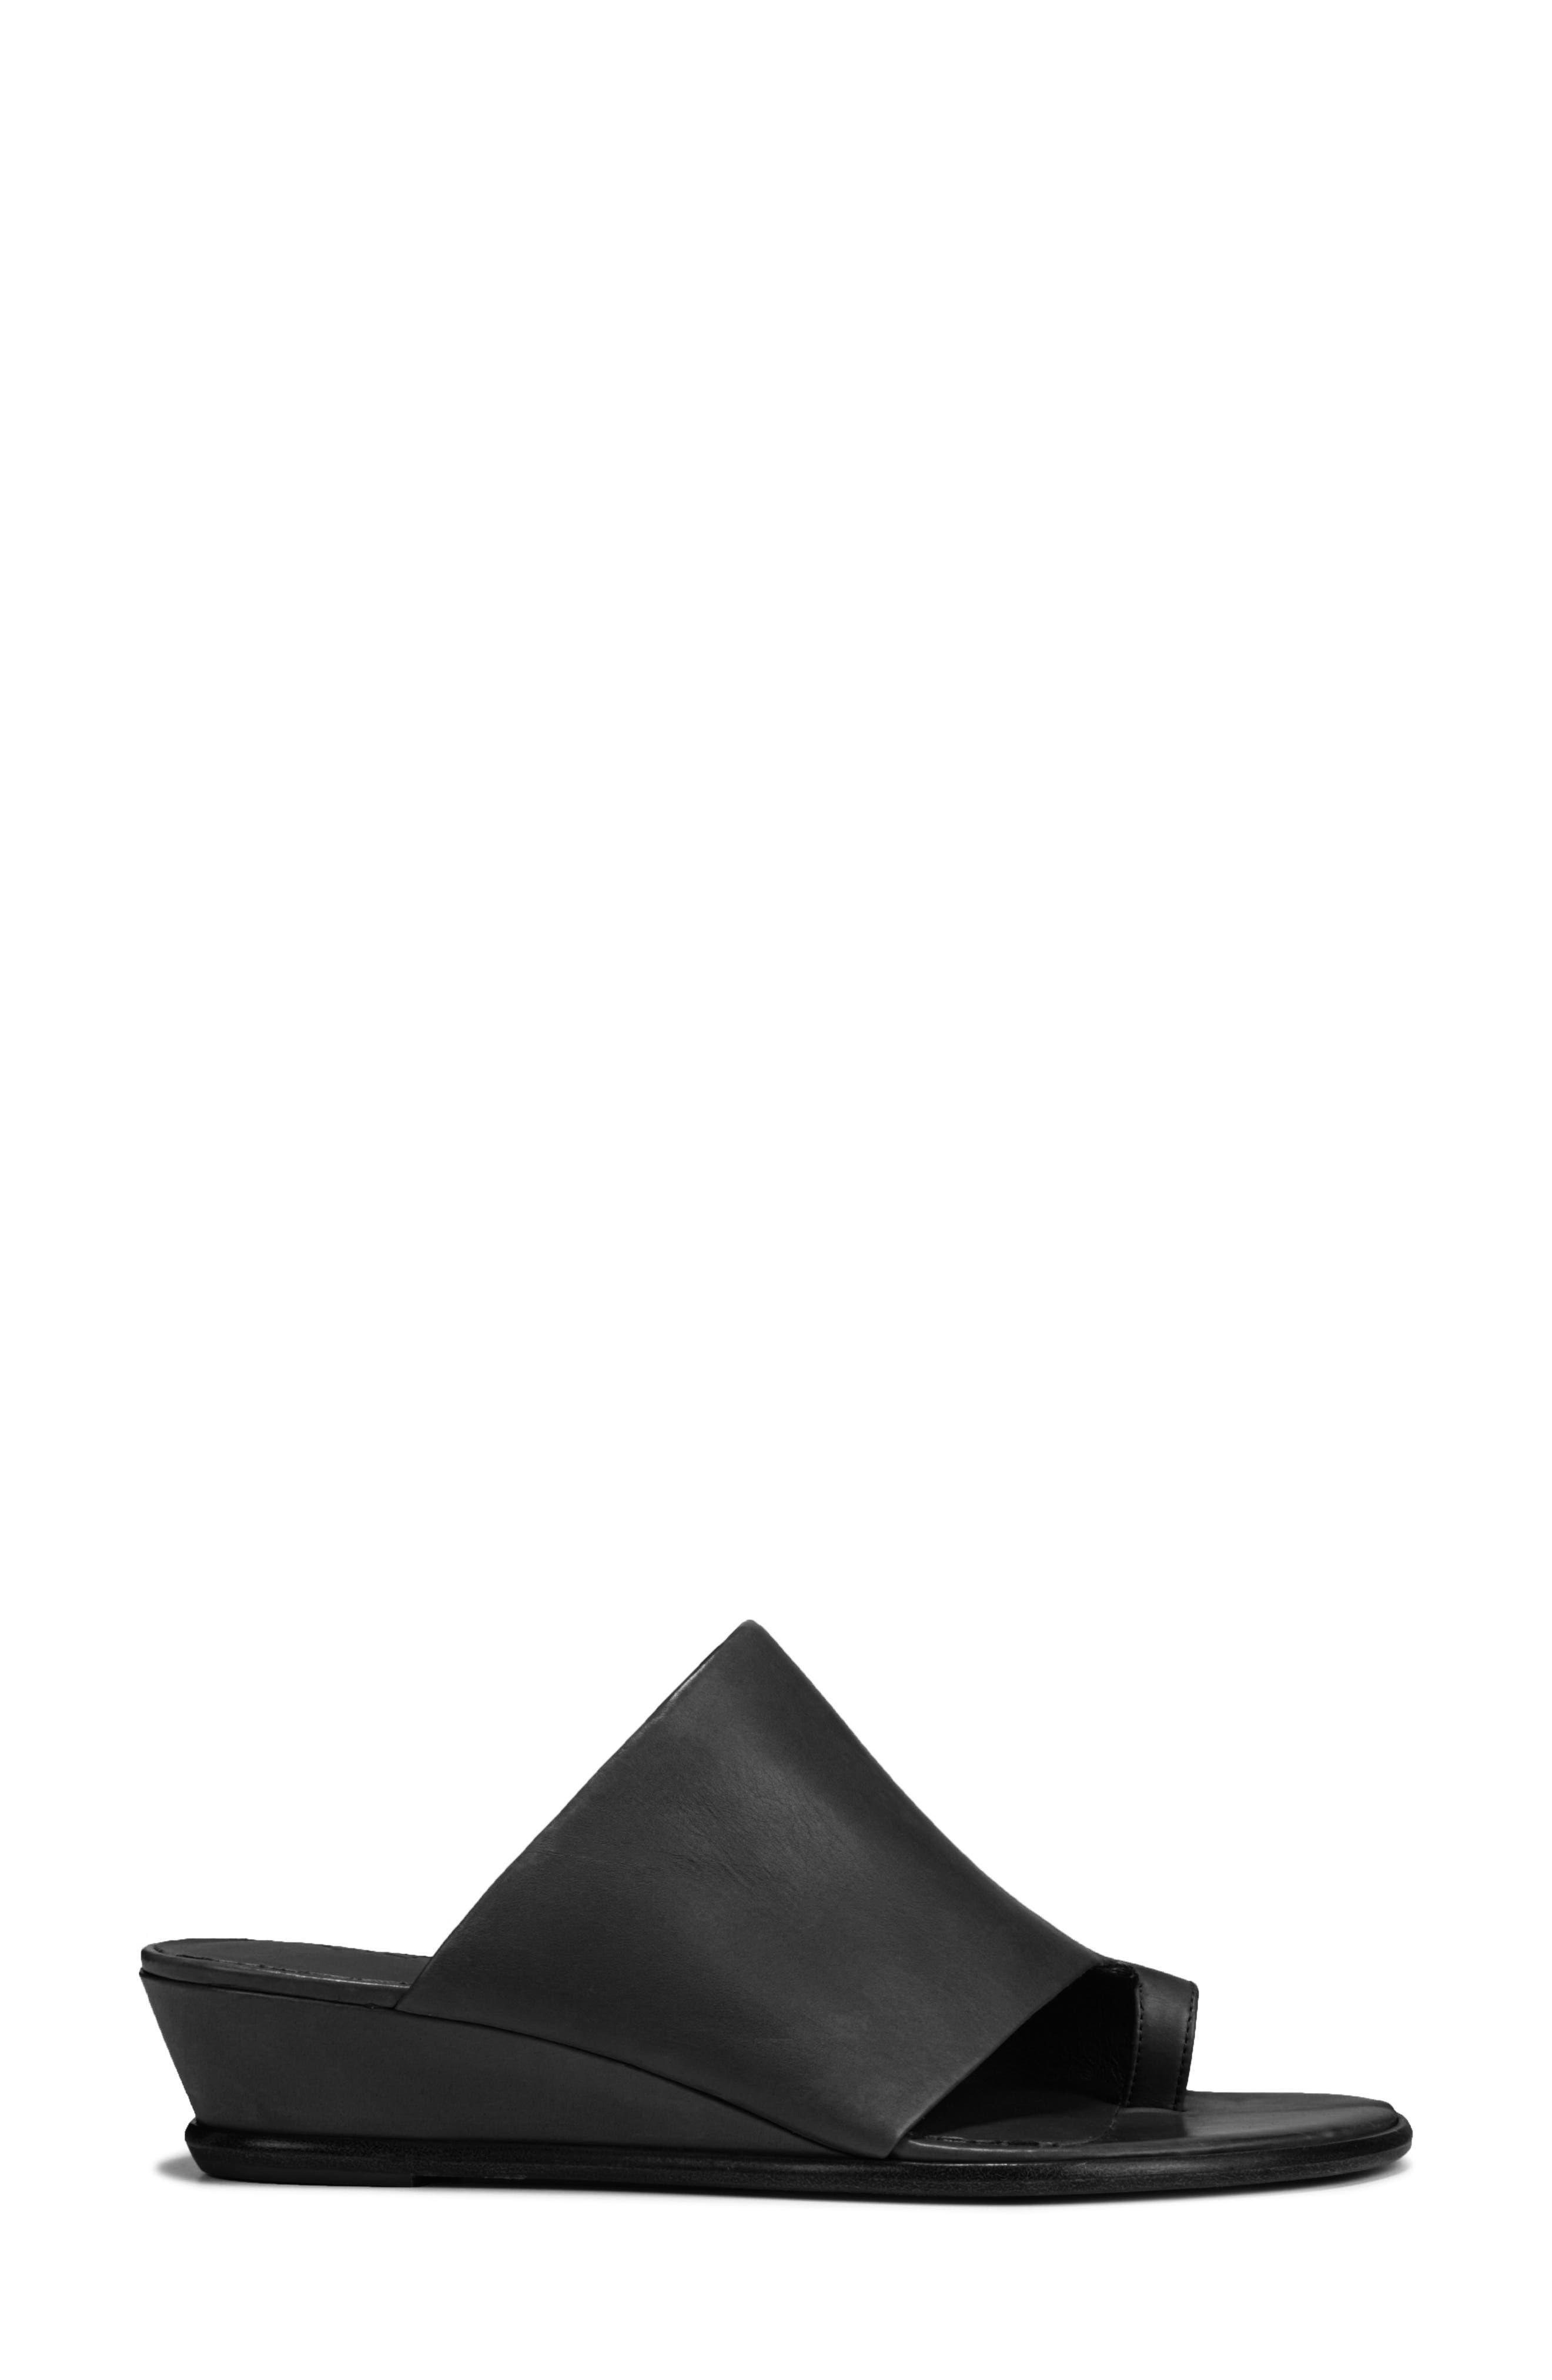 VINCE, Darla Slide Sandal, Alternate thumbnail 3, color, BLACK